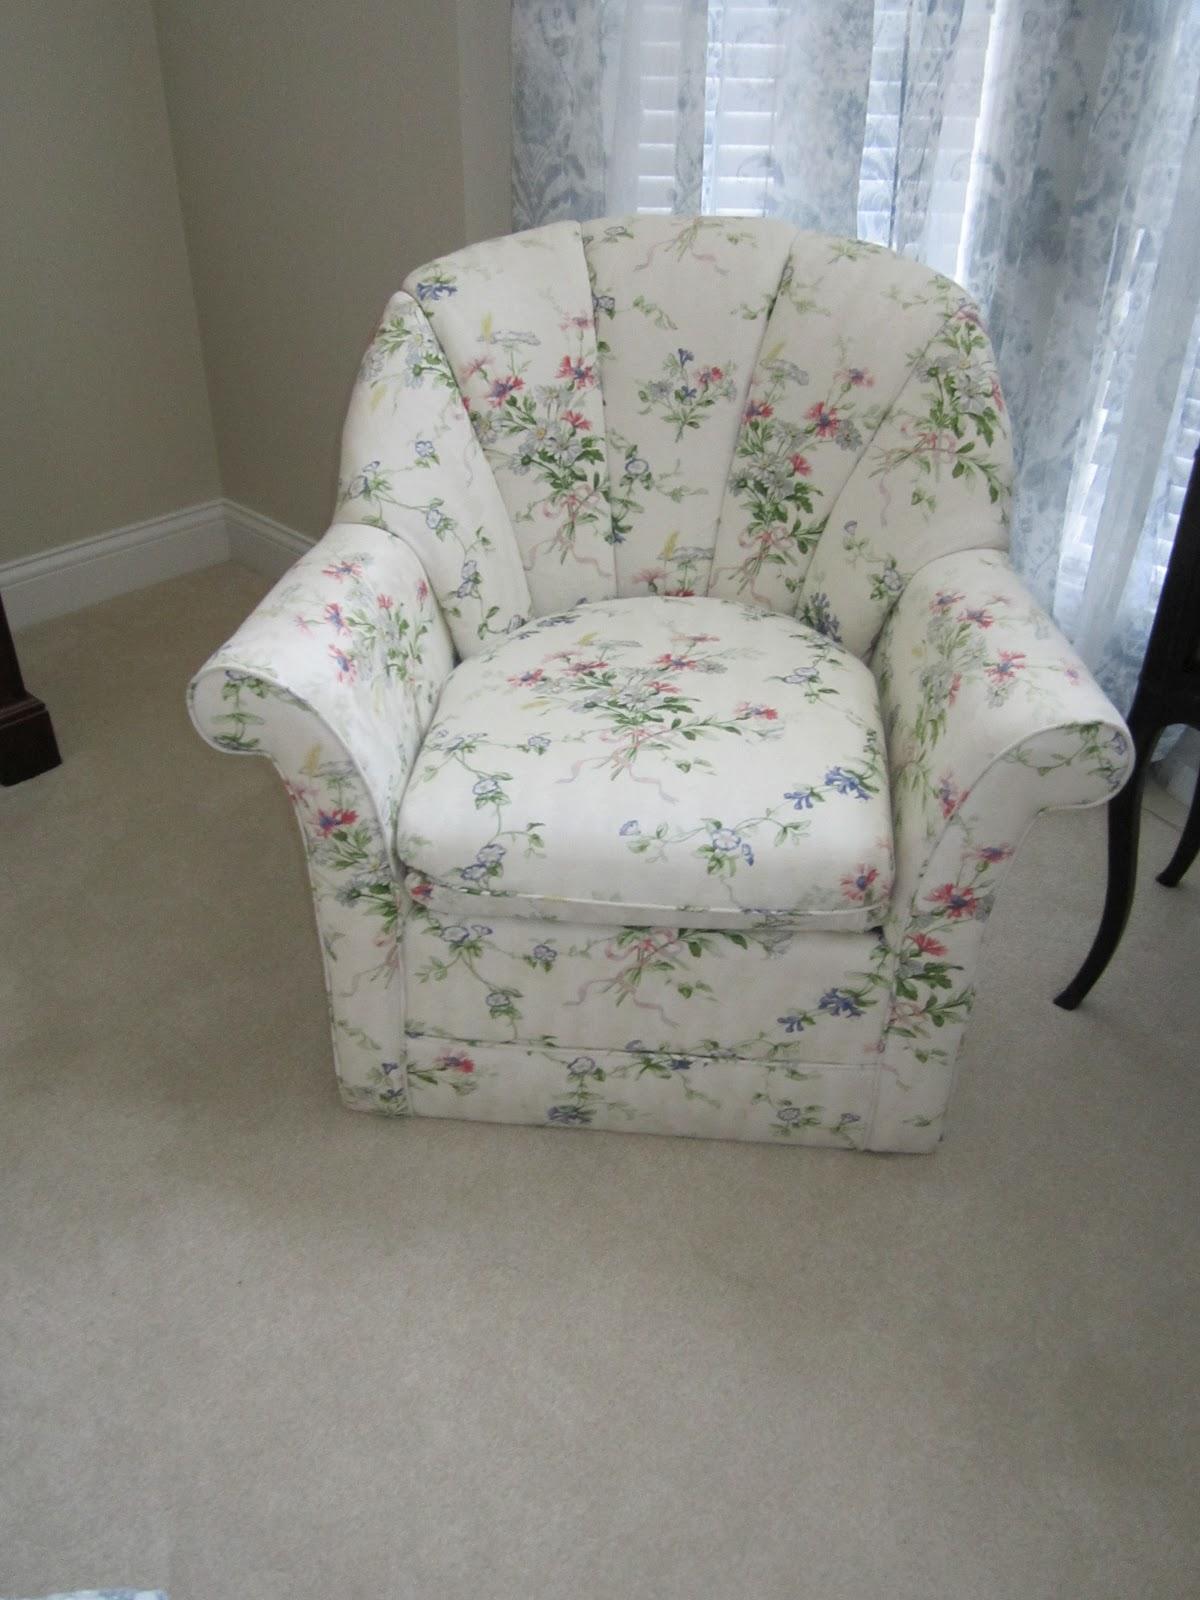 Chair Slipcover T Cushion Chairs At Walmart Headboard And Barrel